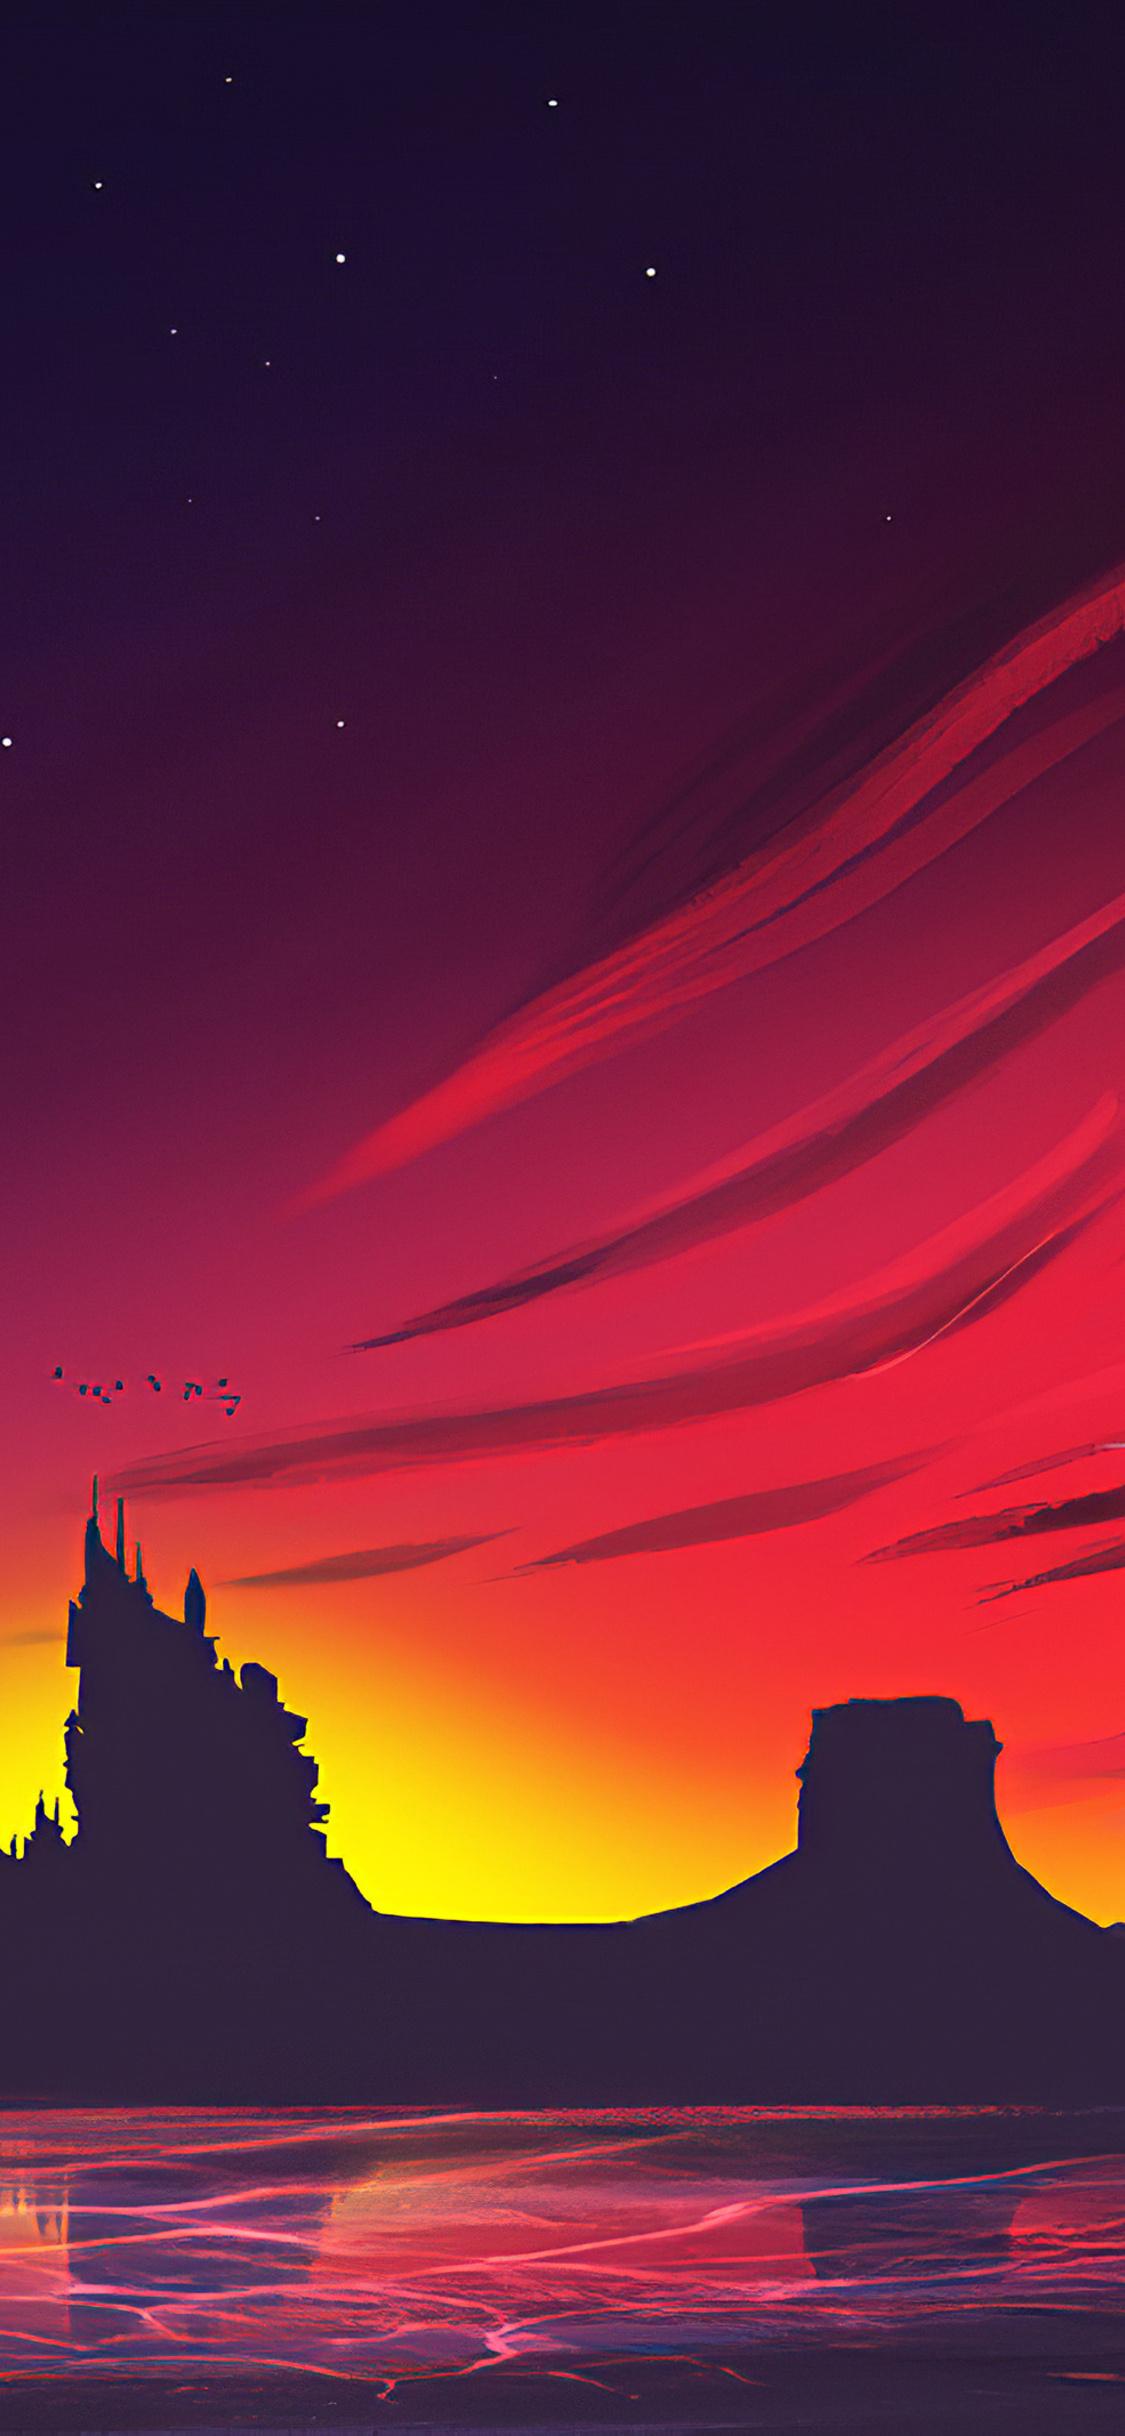 1125x2436 Minimal Sunset Landscape 4k Iphone Xs Iphone 10